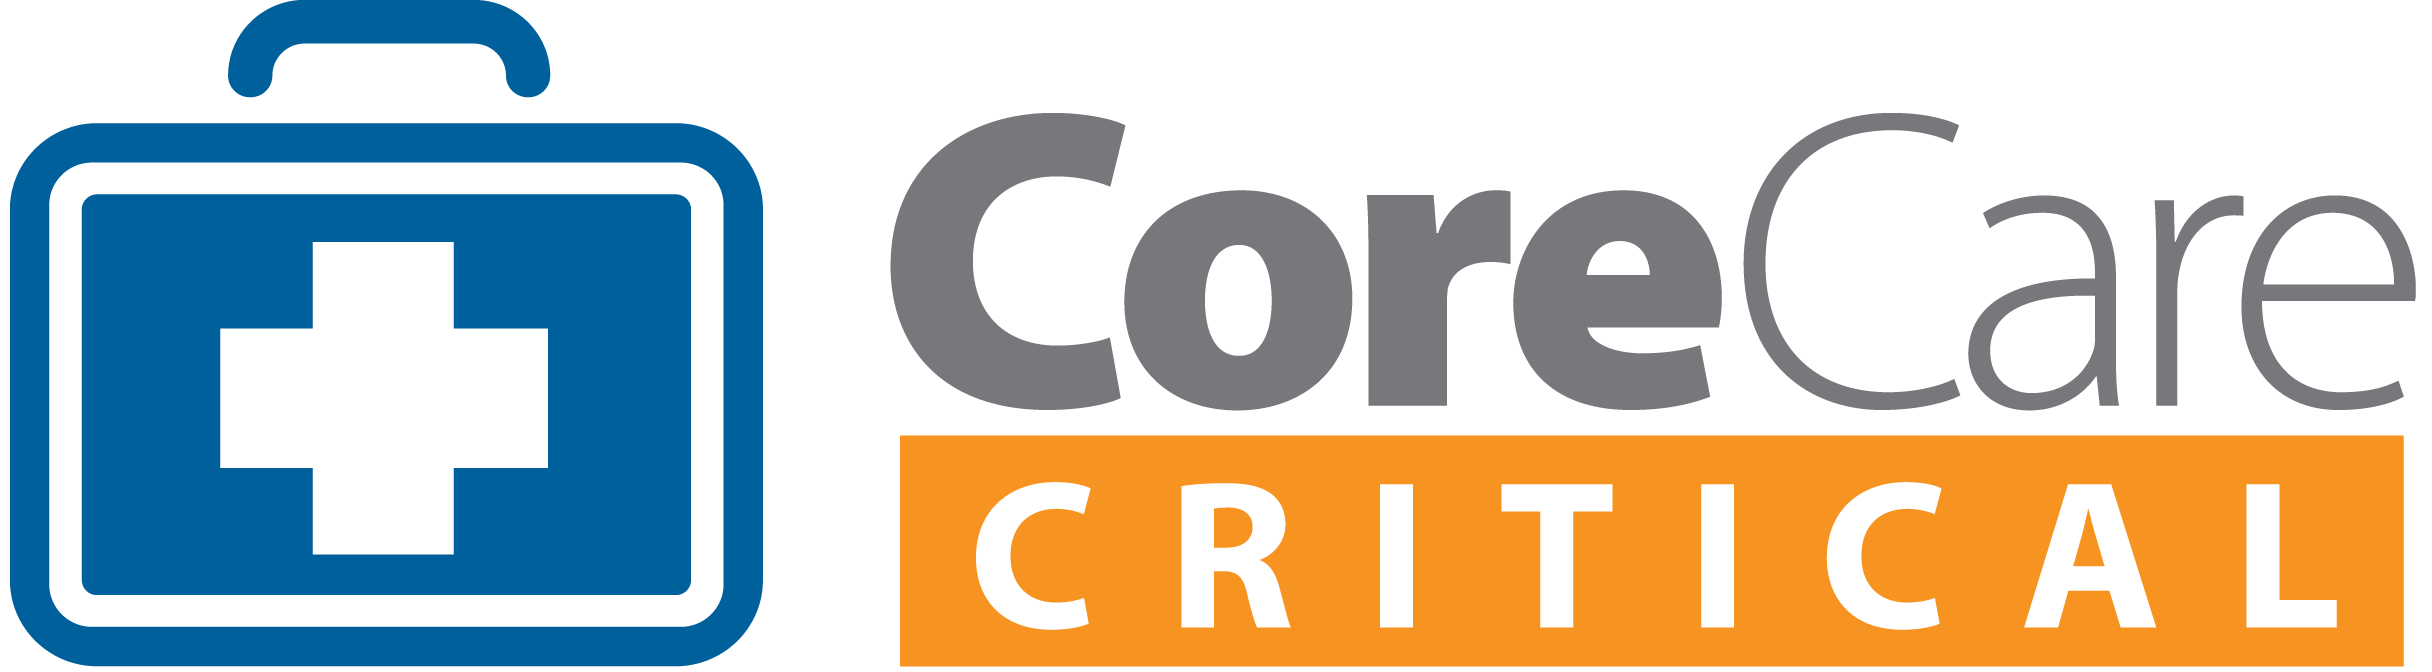 CoreCare_Critical_horiz_RGB.png